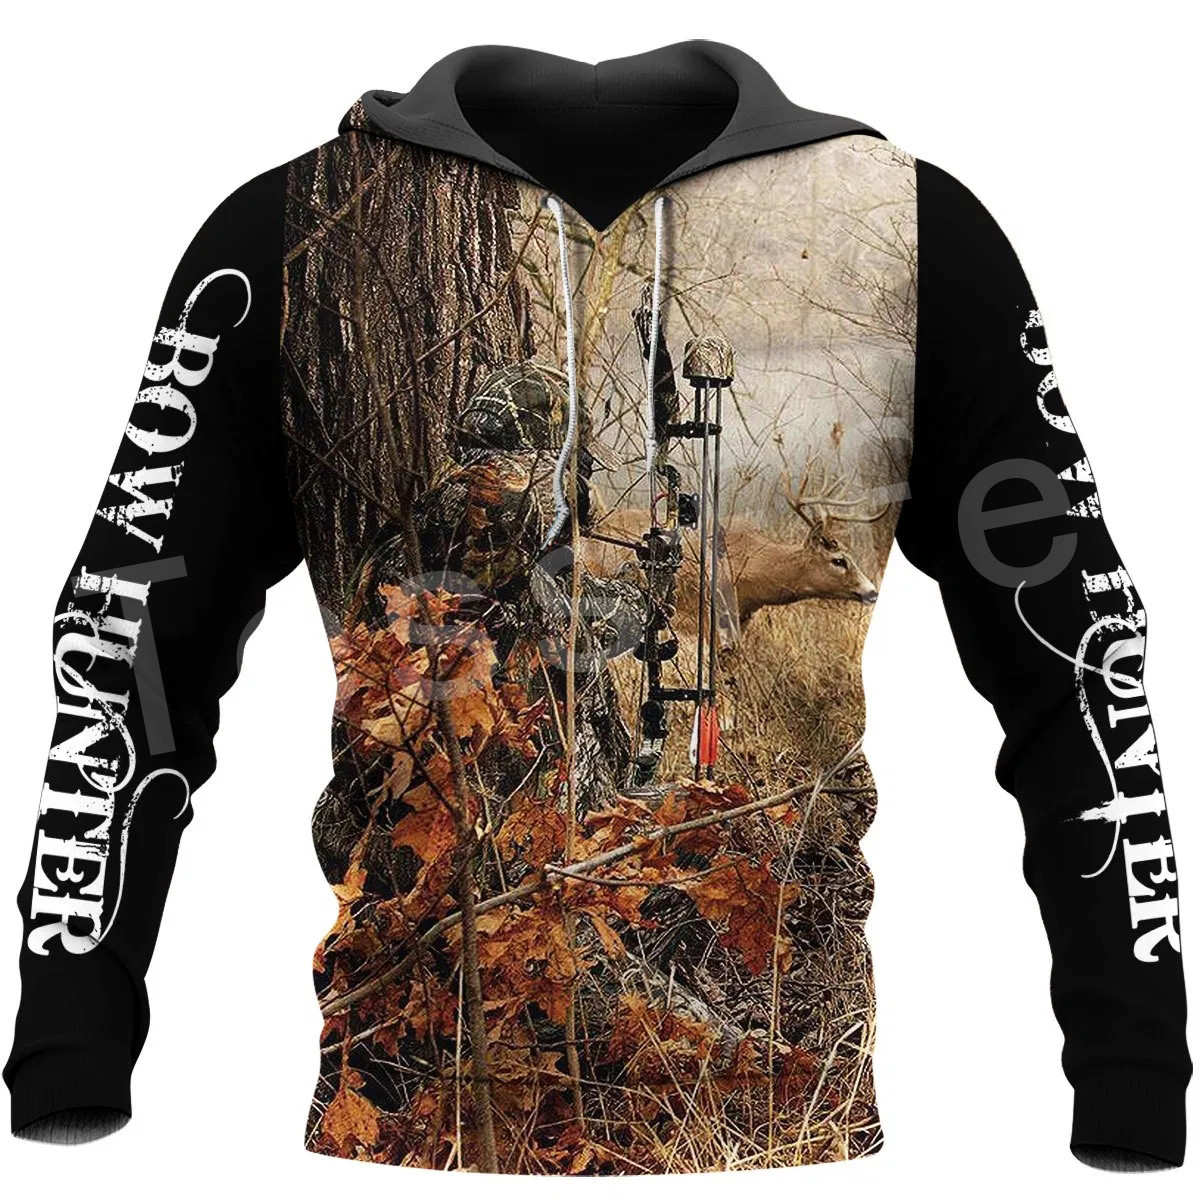 Tessffel Animal Hunting Deer Reaper Bow Hunter Camo NewFashion Tracksuit Casual 3DPrint Zipper/Hoodies/Sweatshirts/Jacket A-6